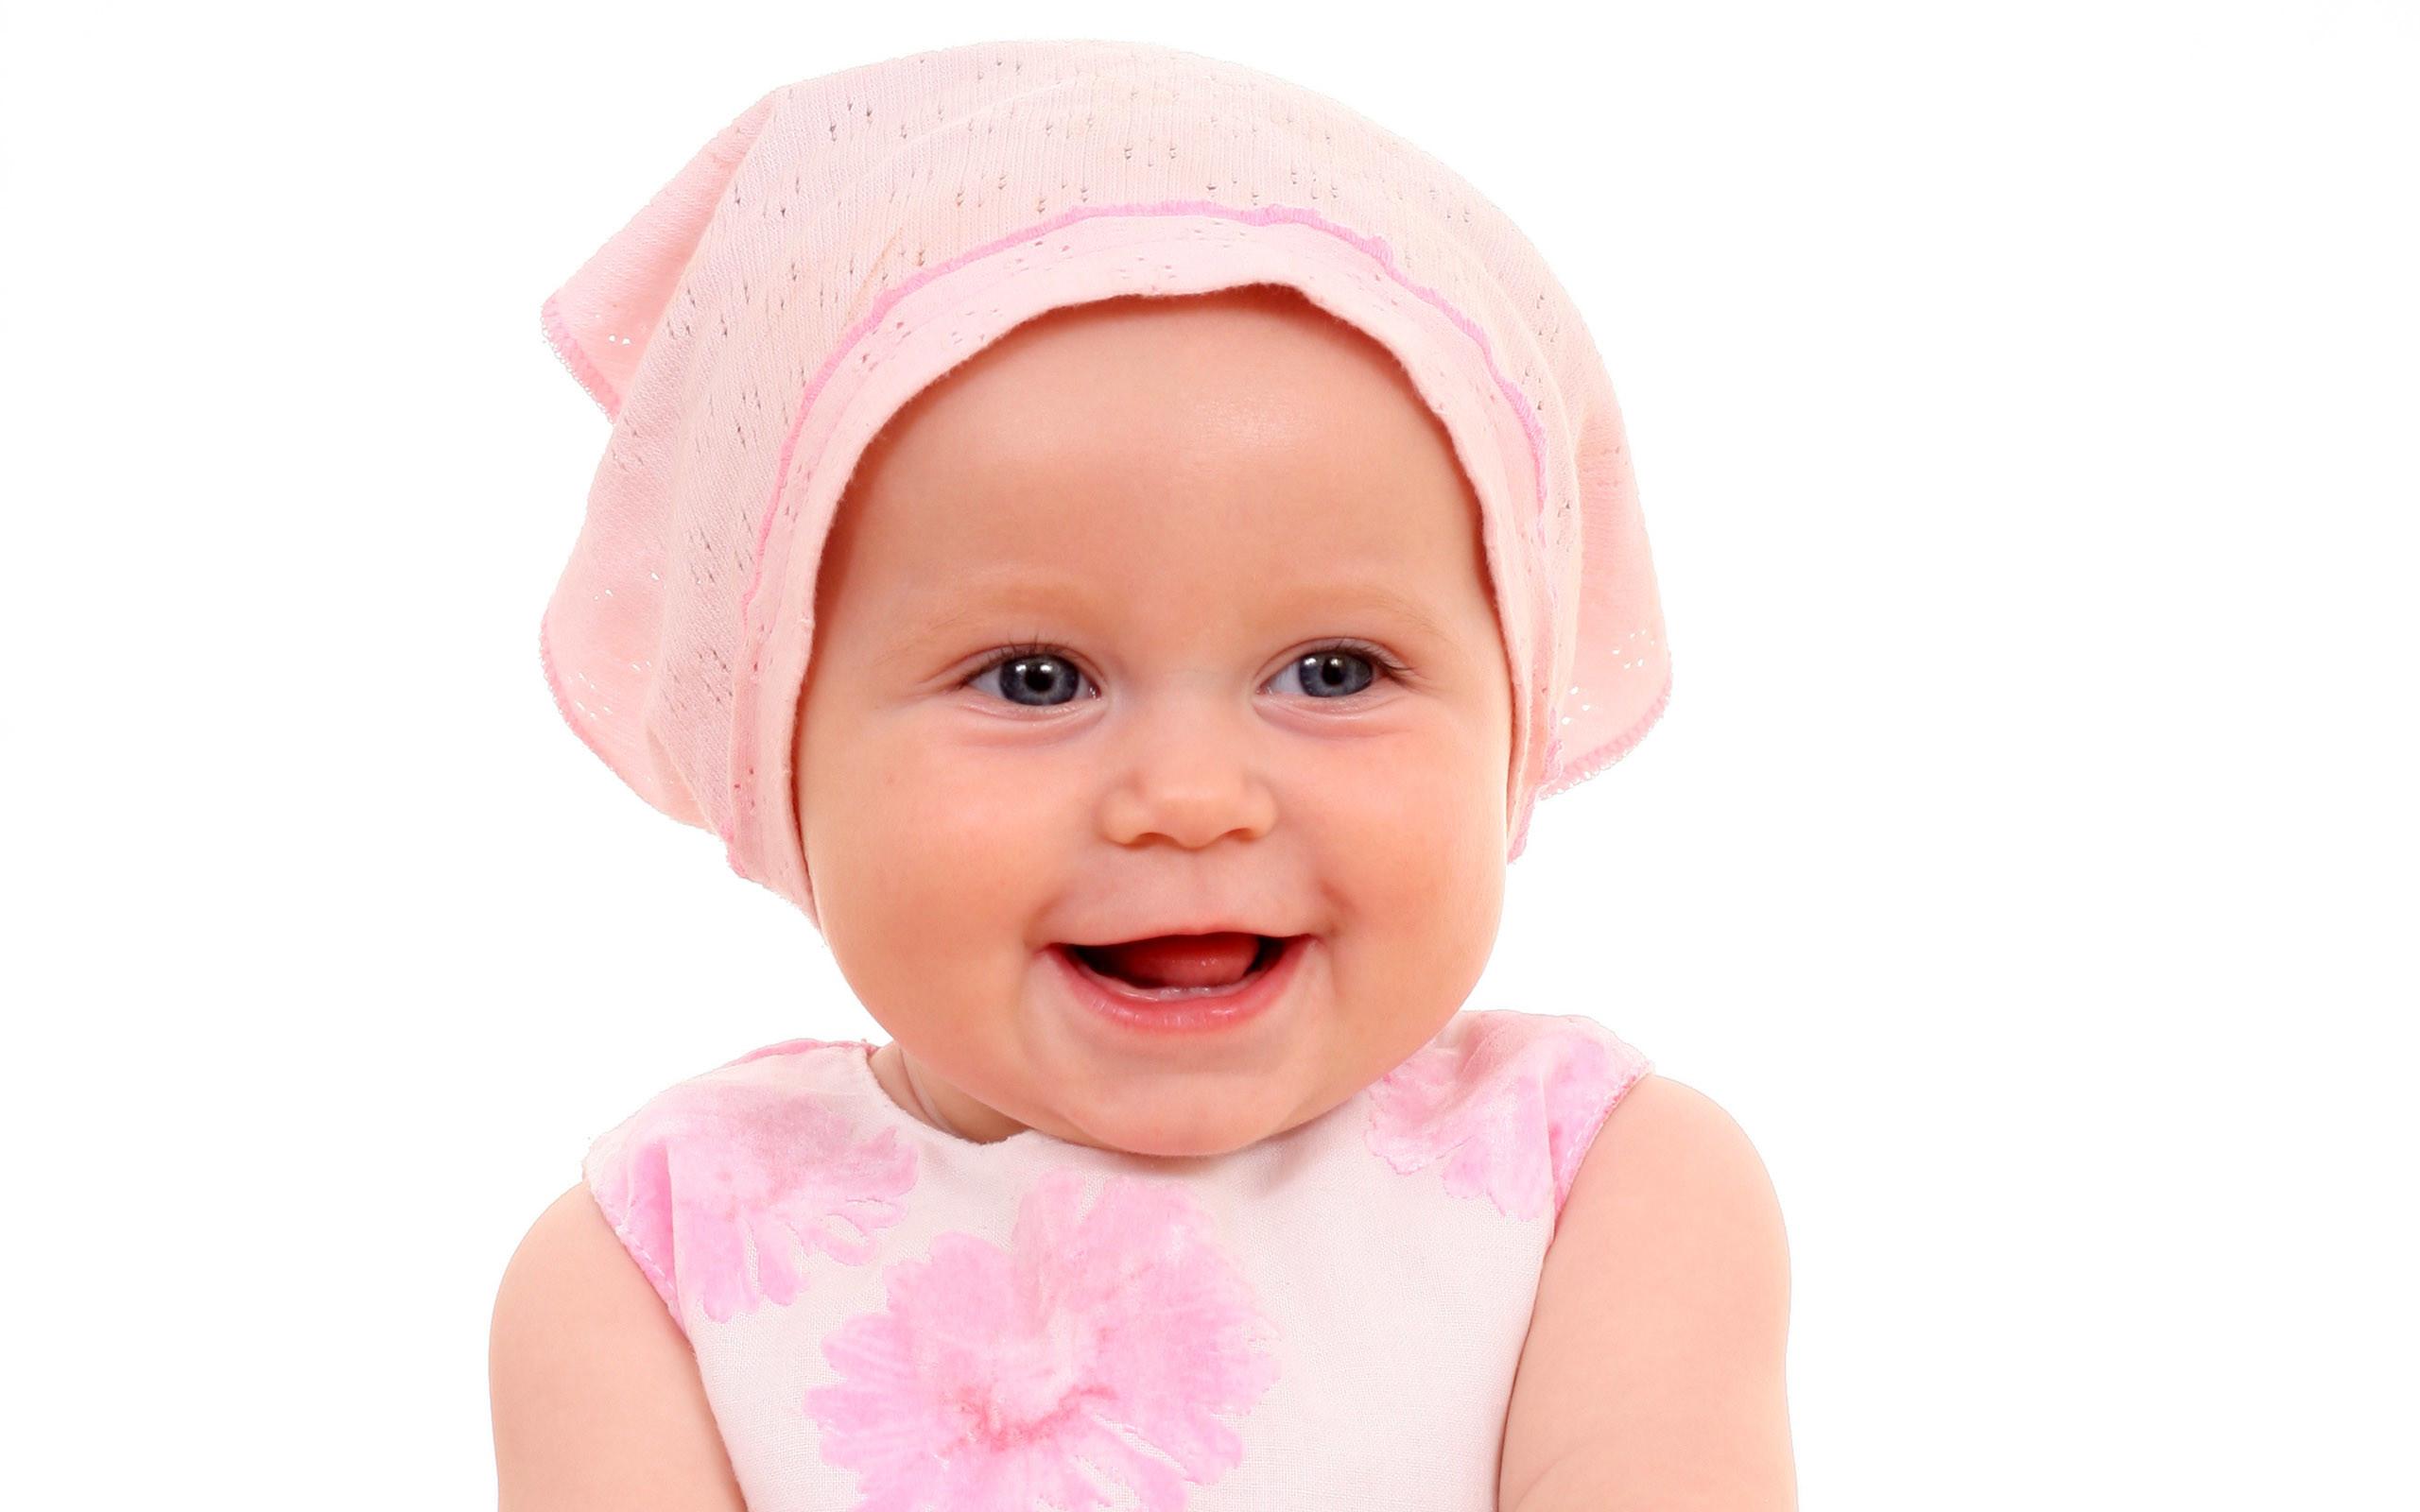 Baby Girl Wallpaper 63 Images